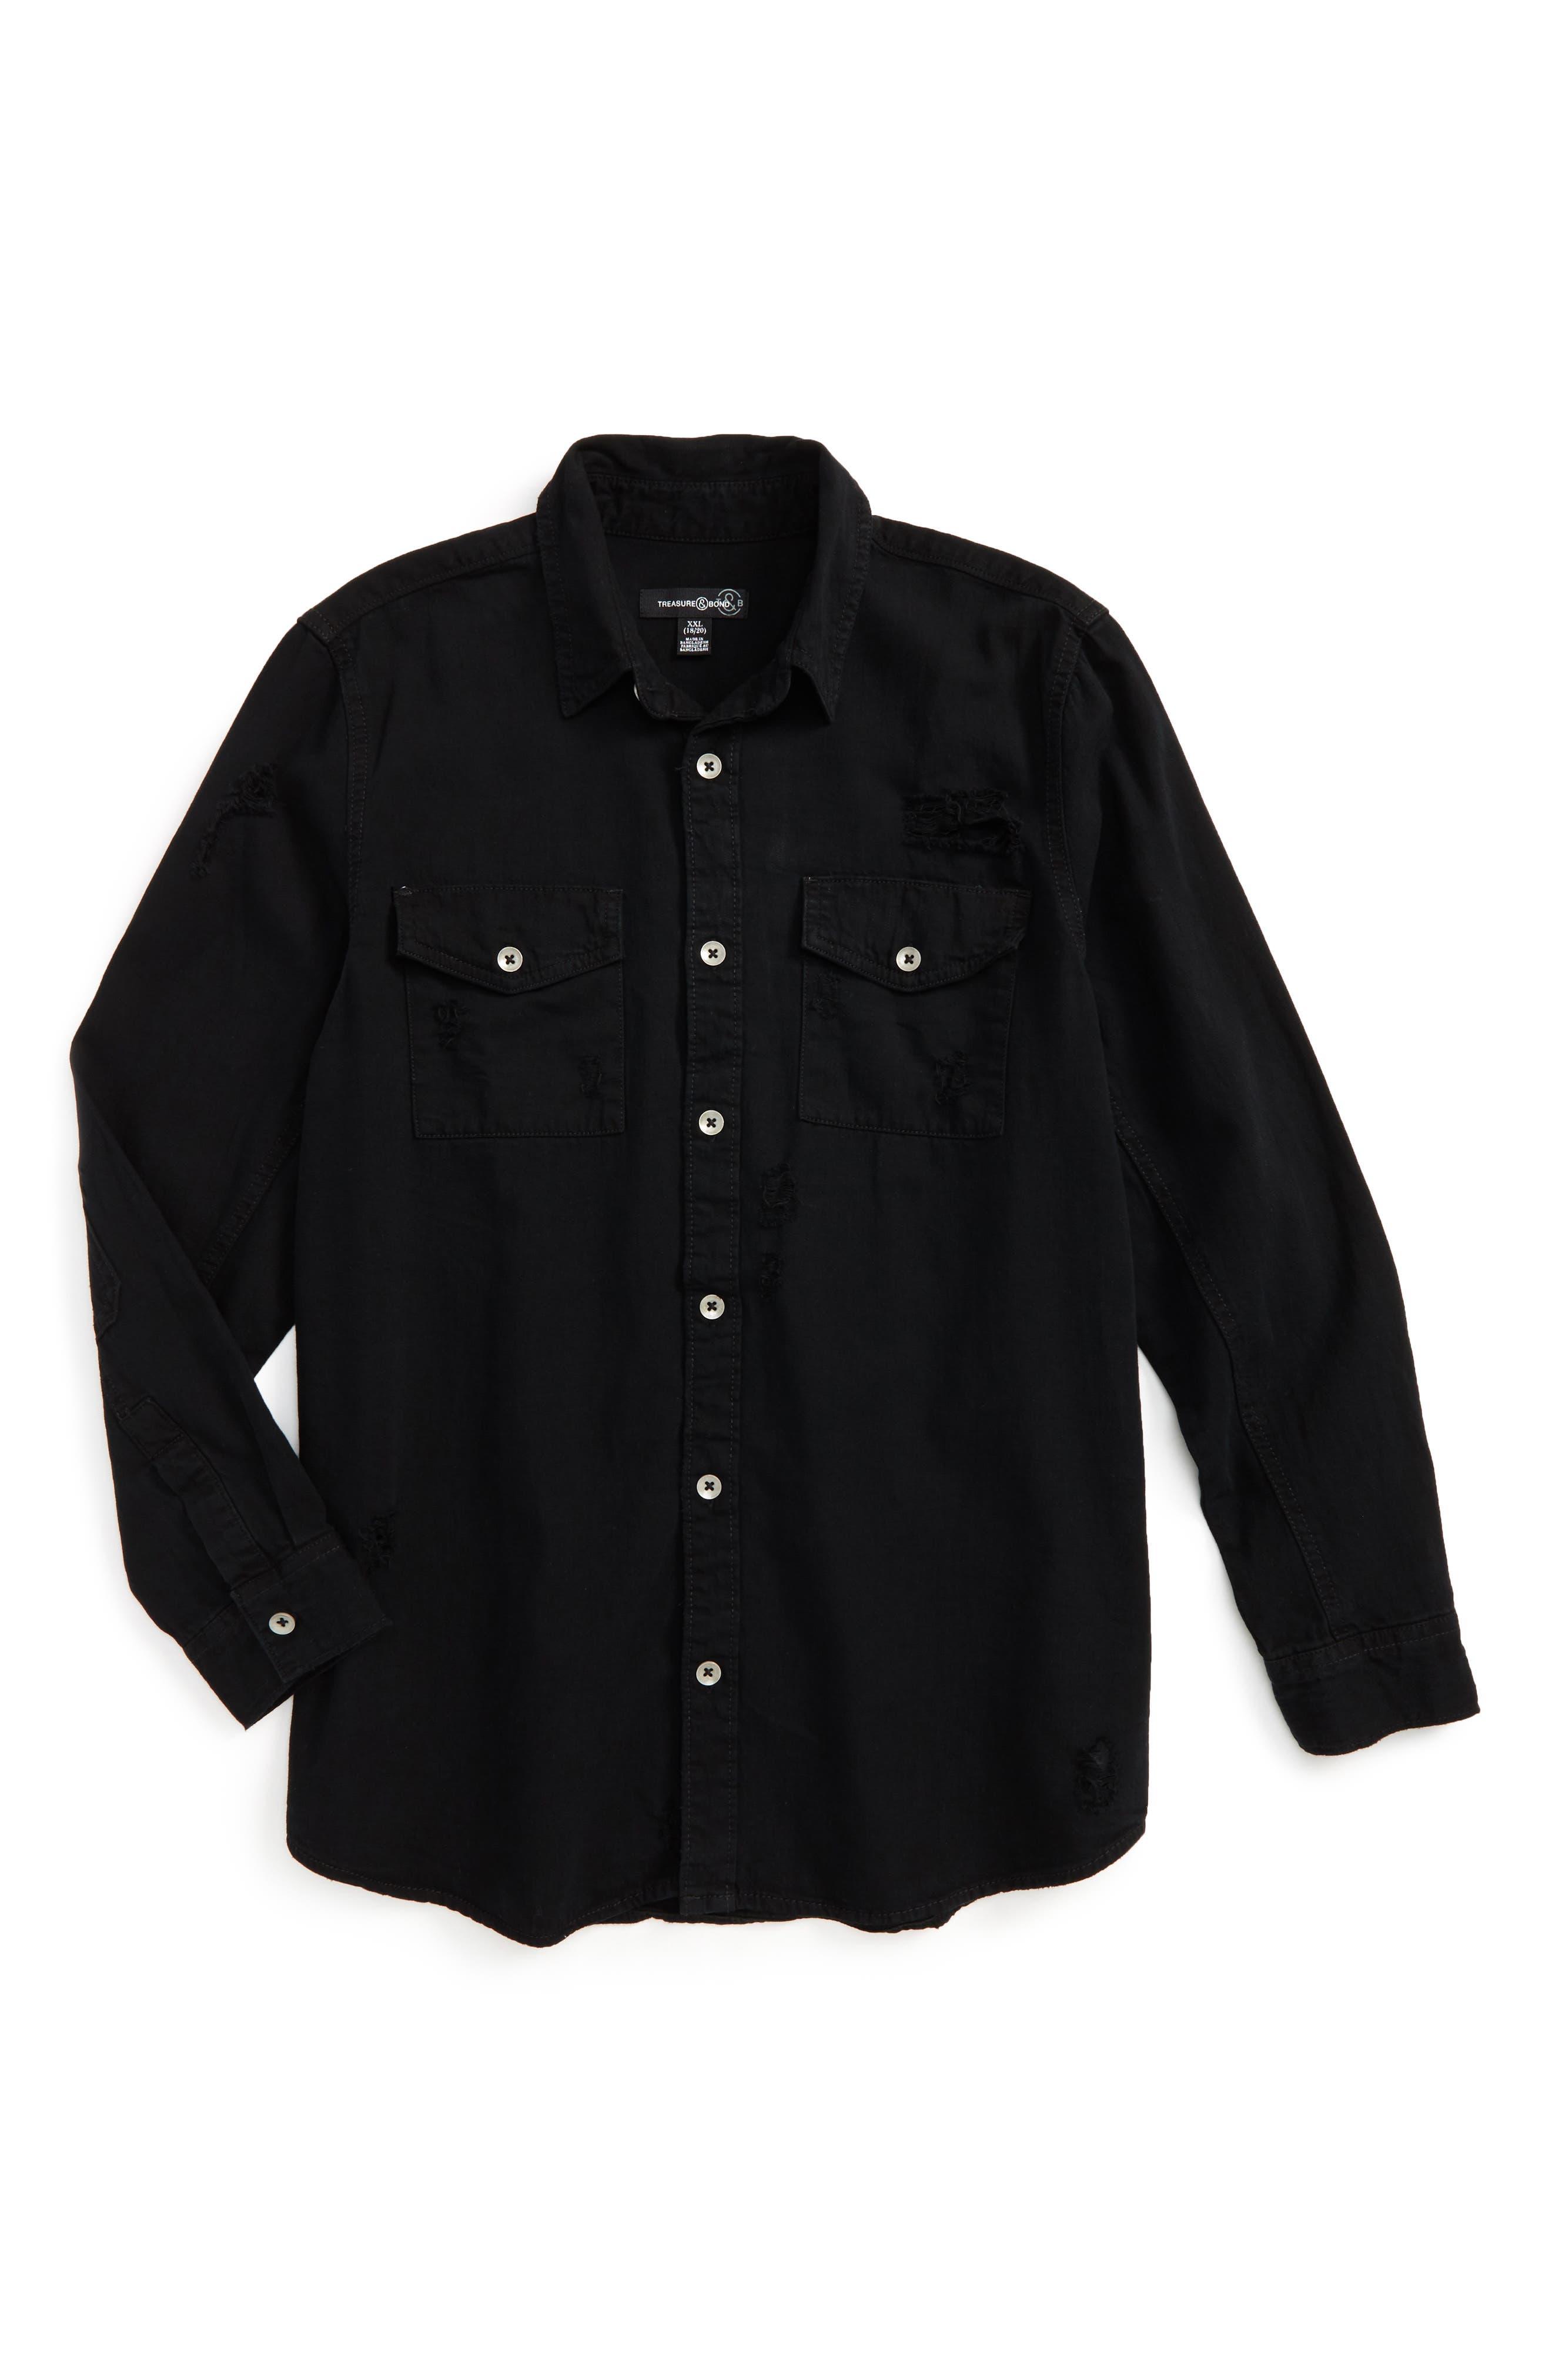 Treasure & Bond Distressed Woven Shirt (Big Boys)